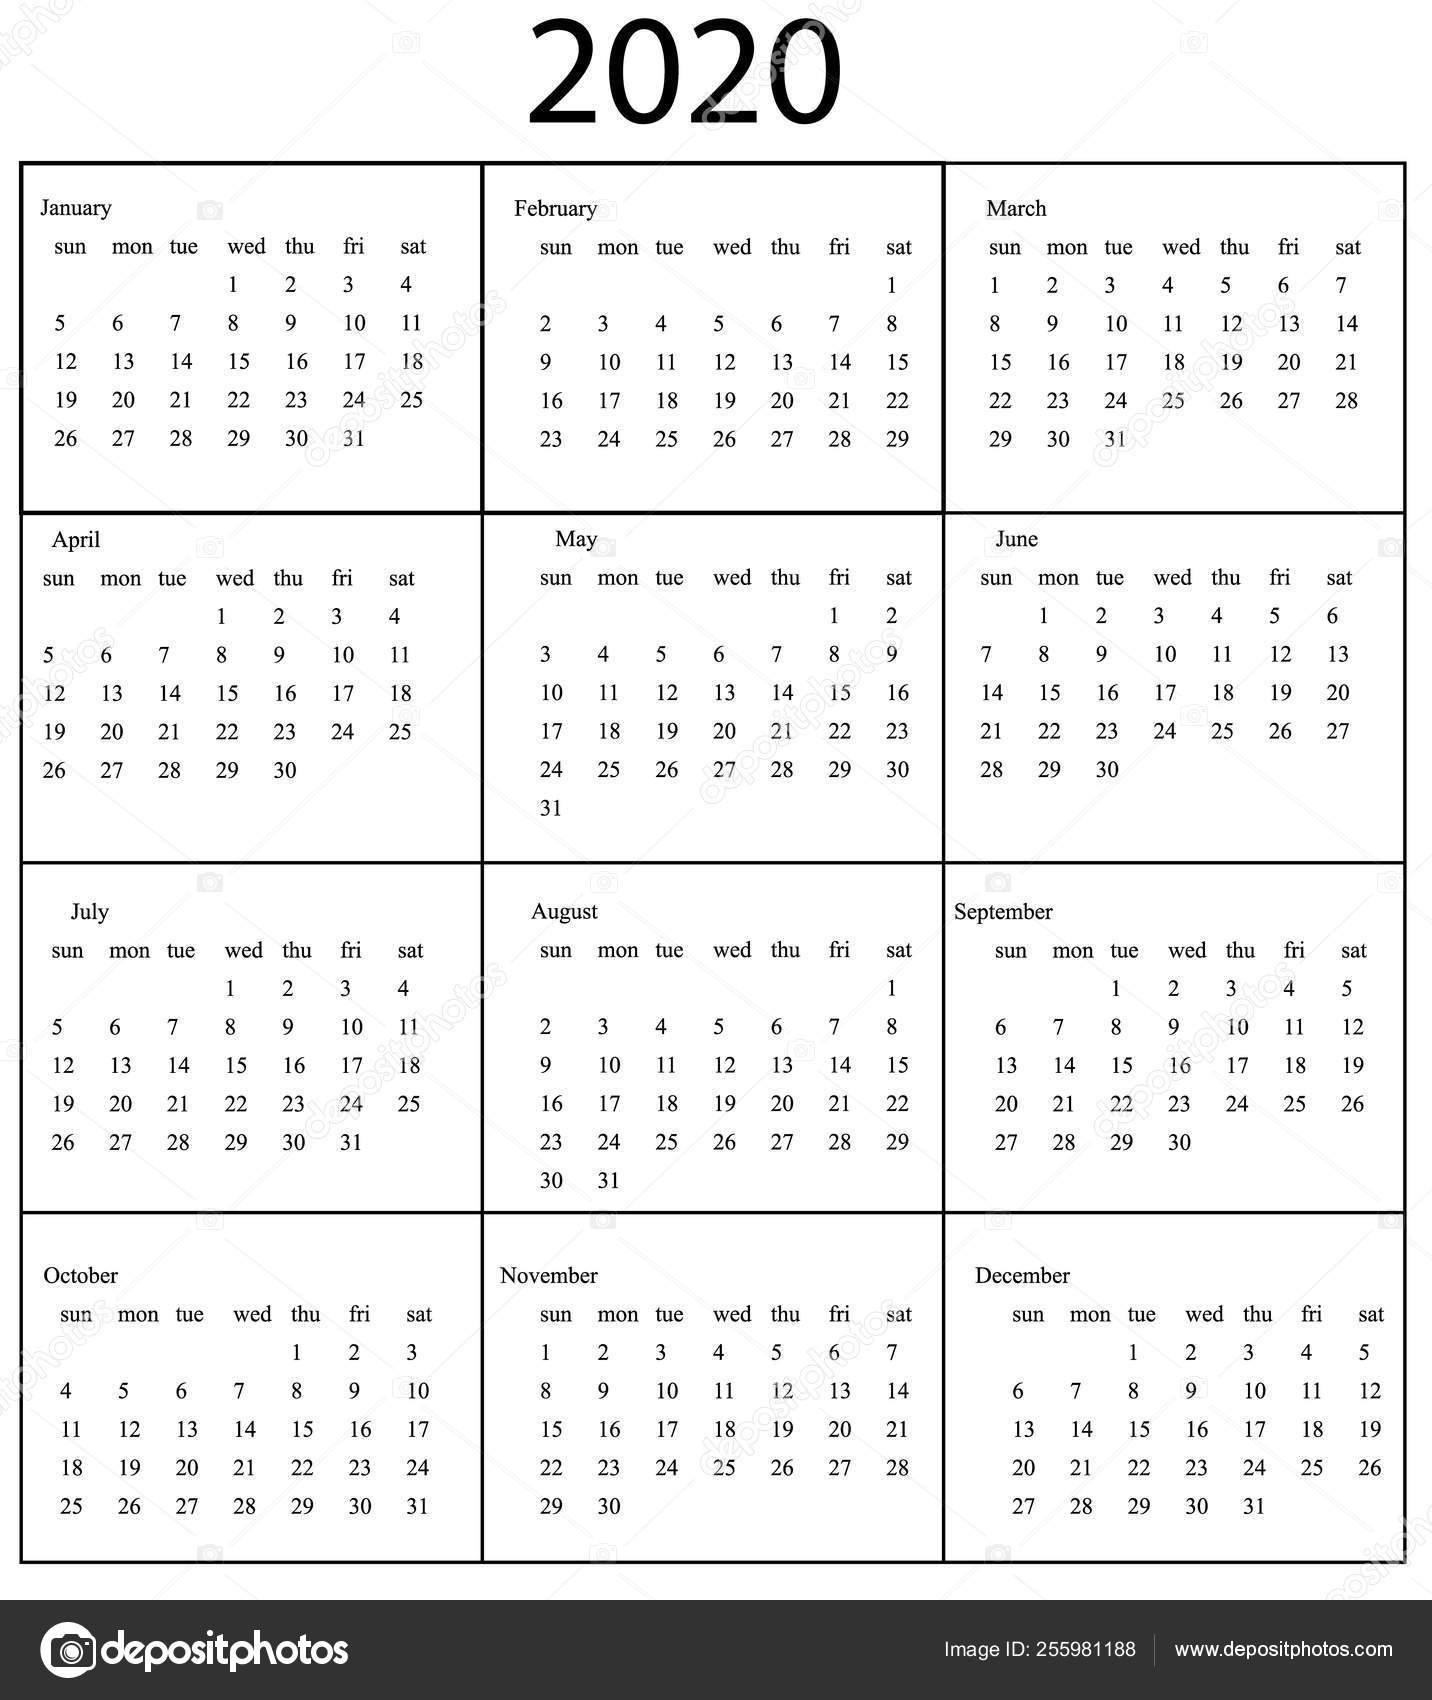 2020 Calendar Template. Starts Sunday — Векторное Изображение with regard to Monday To Sunday Printable 2020 Calendar